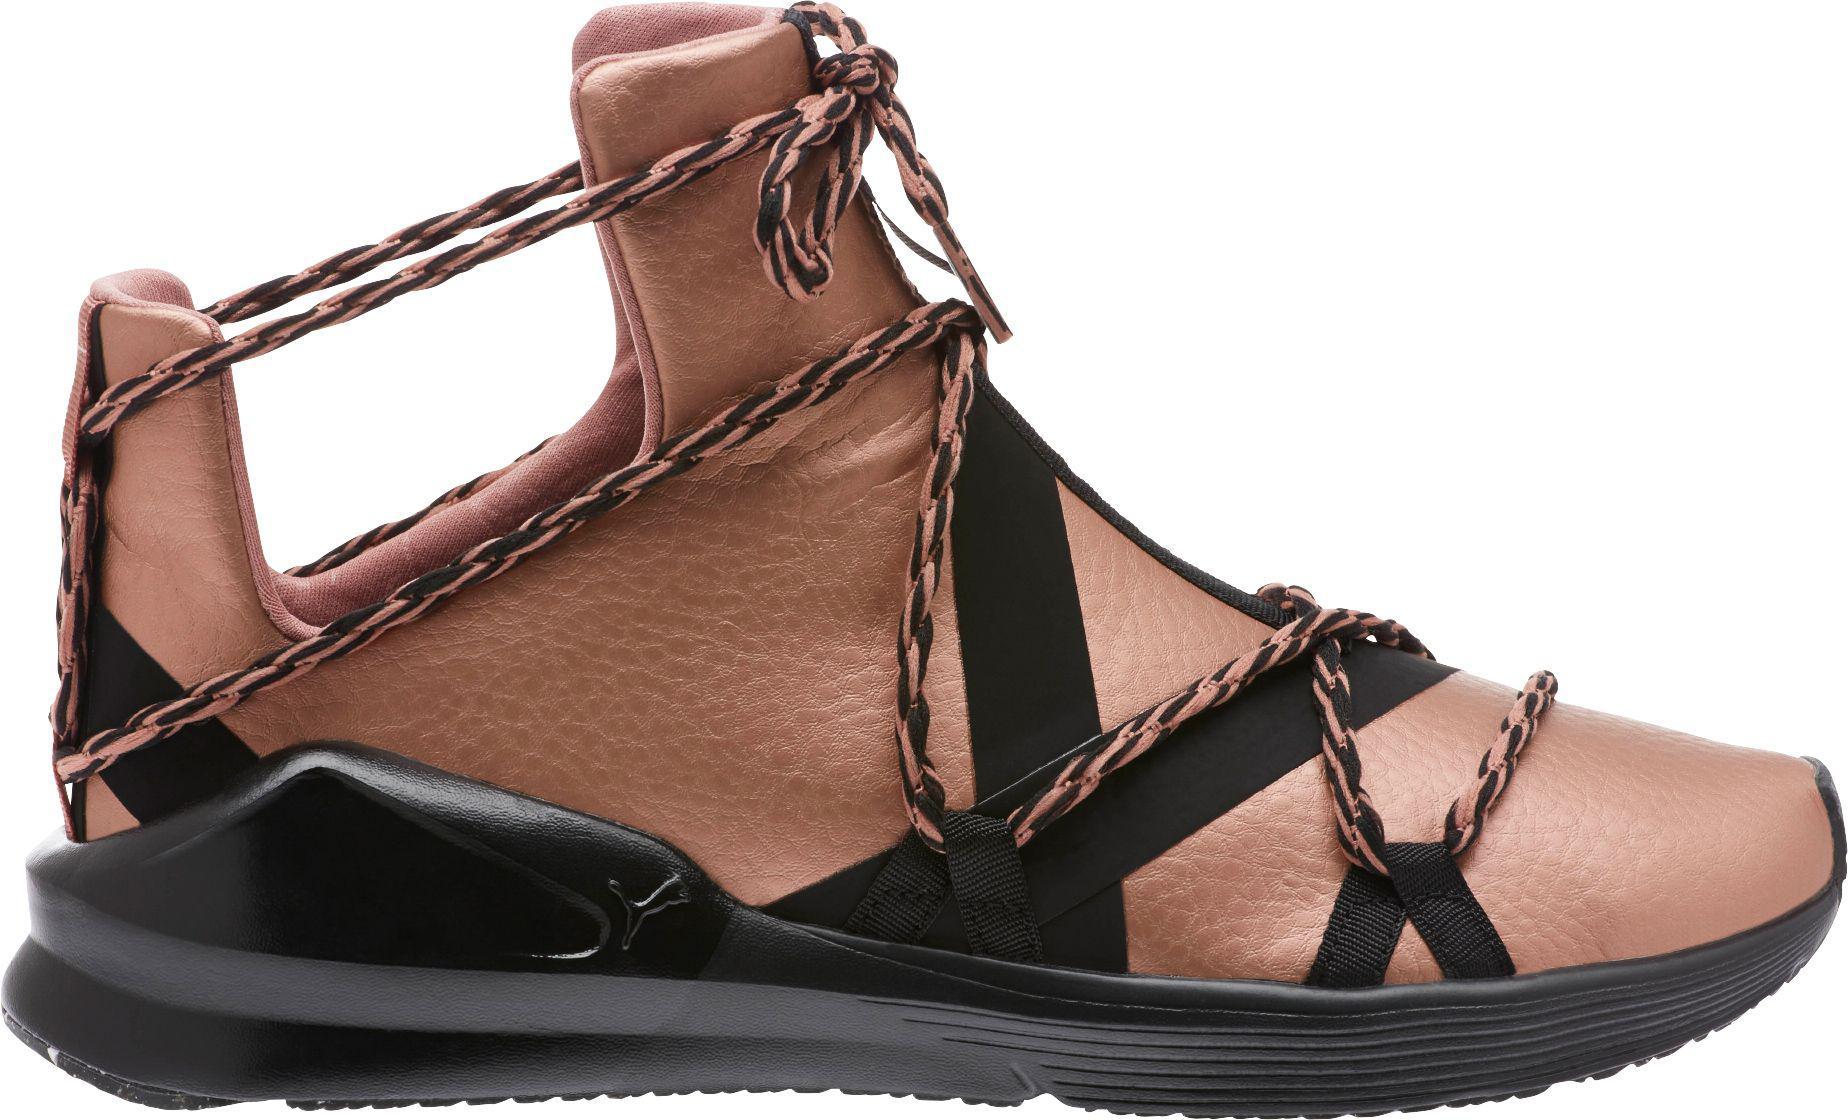 76e48c07eba ... Training Shoes  authorized site d1235 13efb PUMA. Womens Pink Fierce  Rope Copper Shoes ...